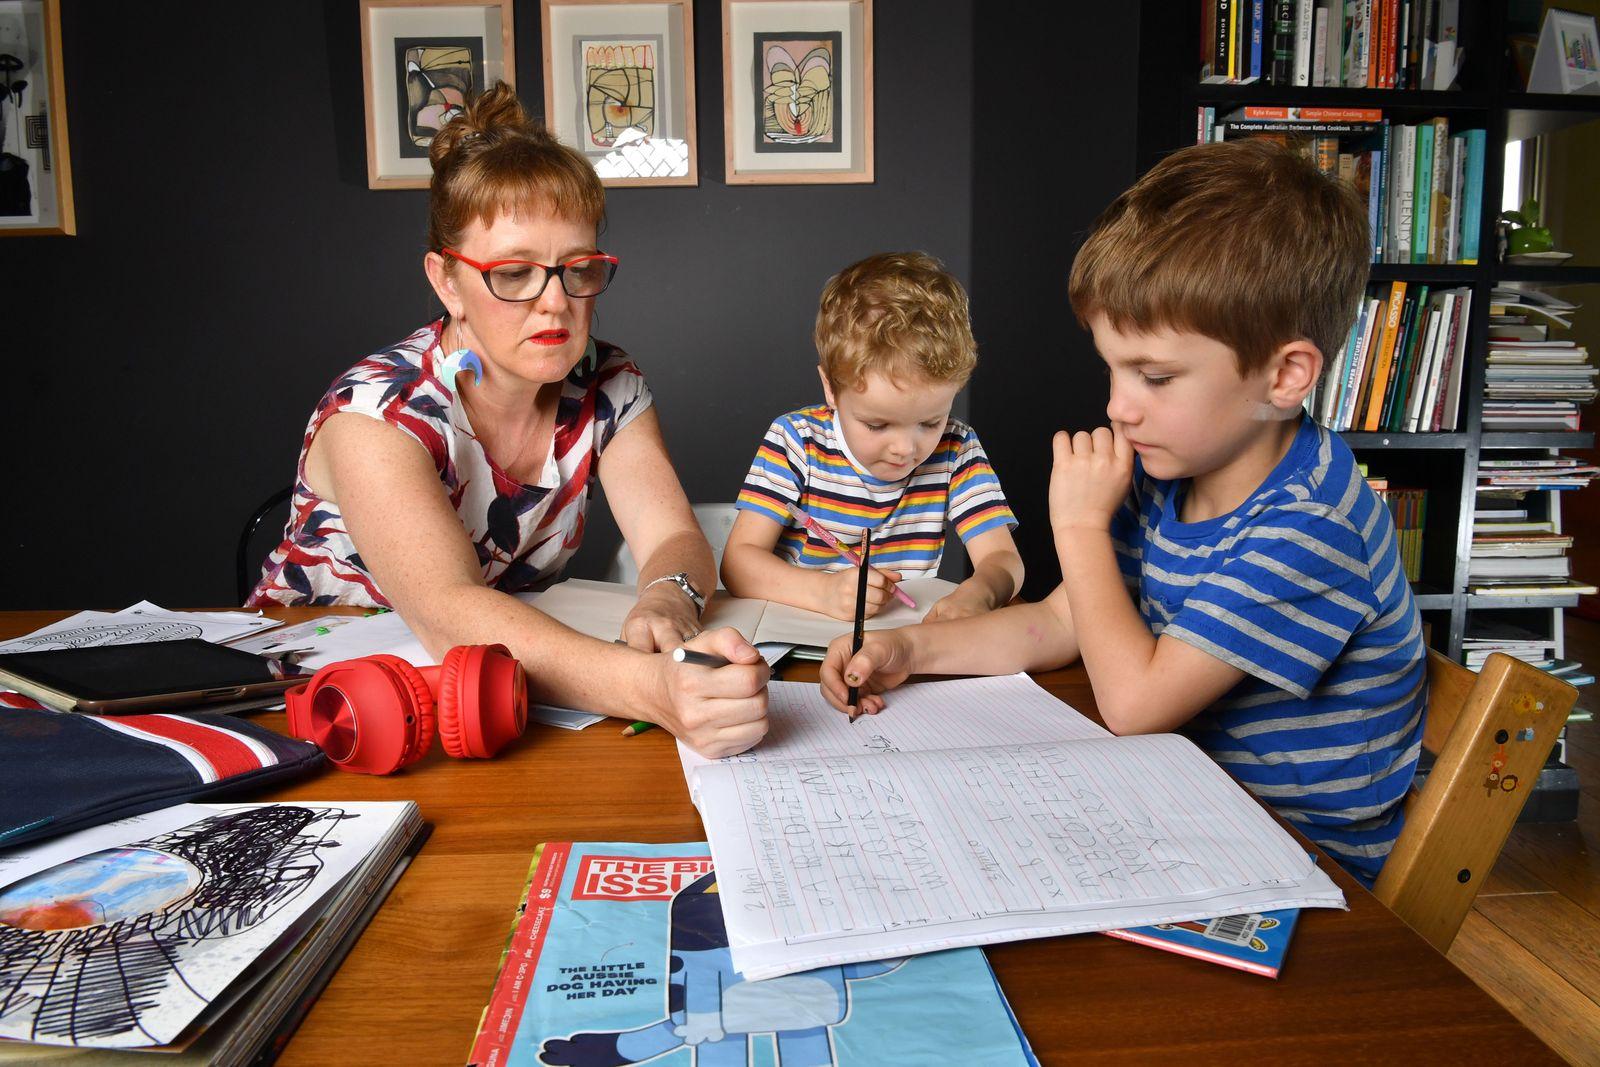 Home schooling during coronavirus pandemic in Australia, Brisbane - 15 Apr 2020